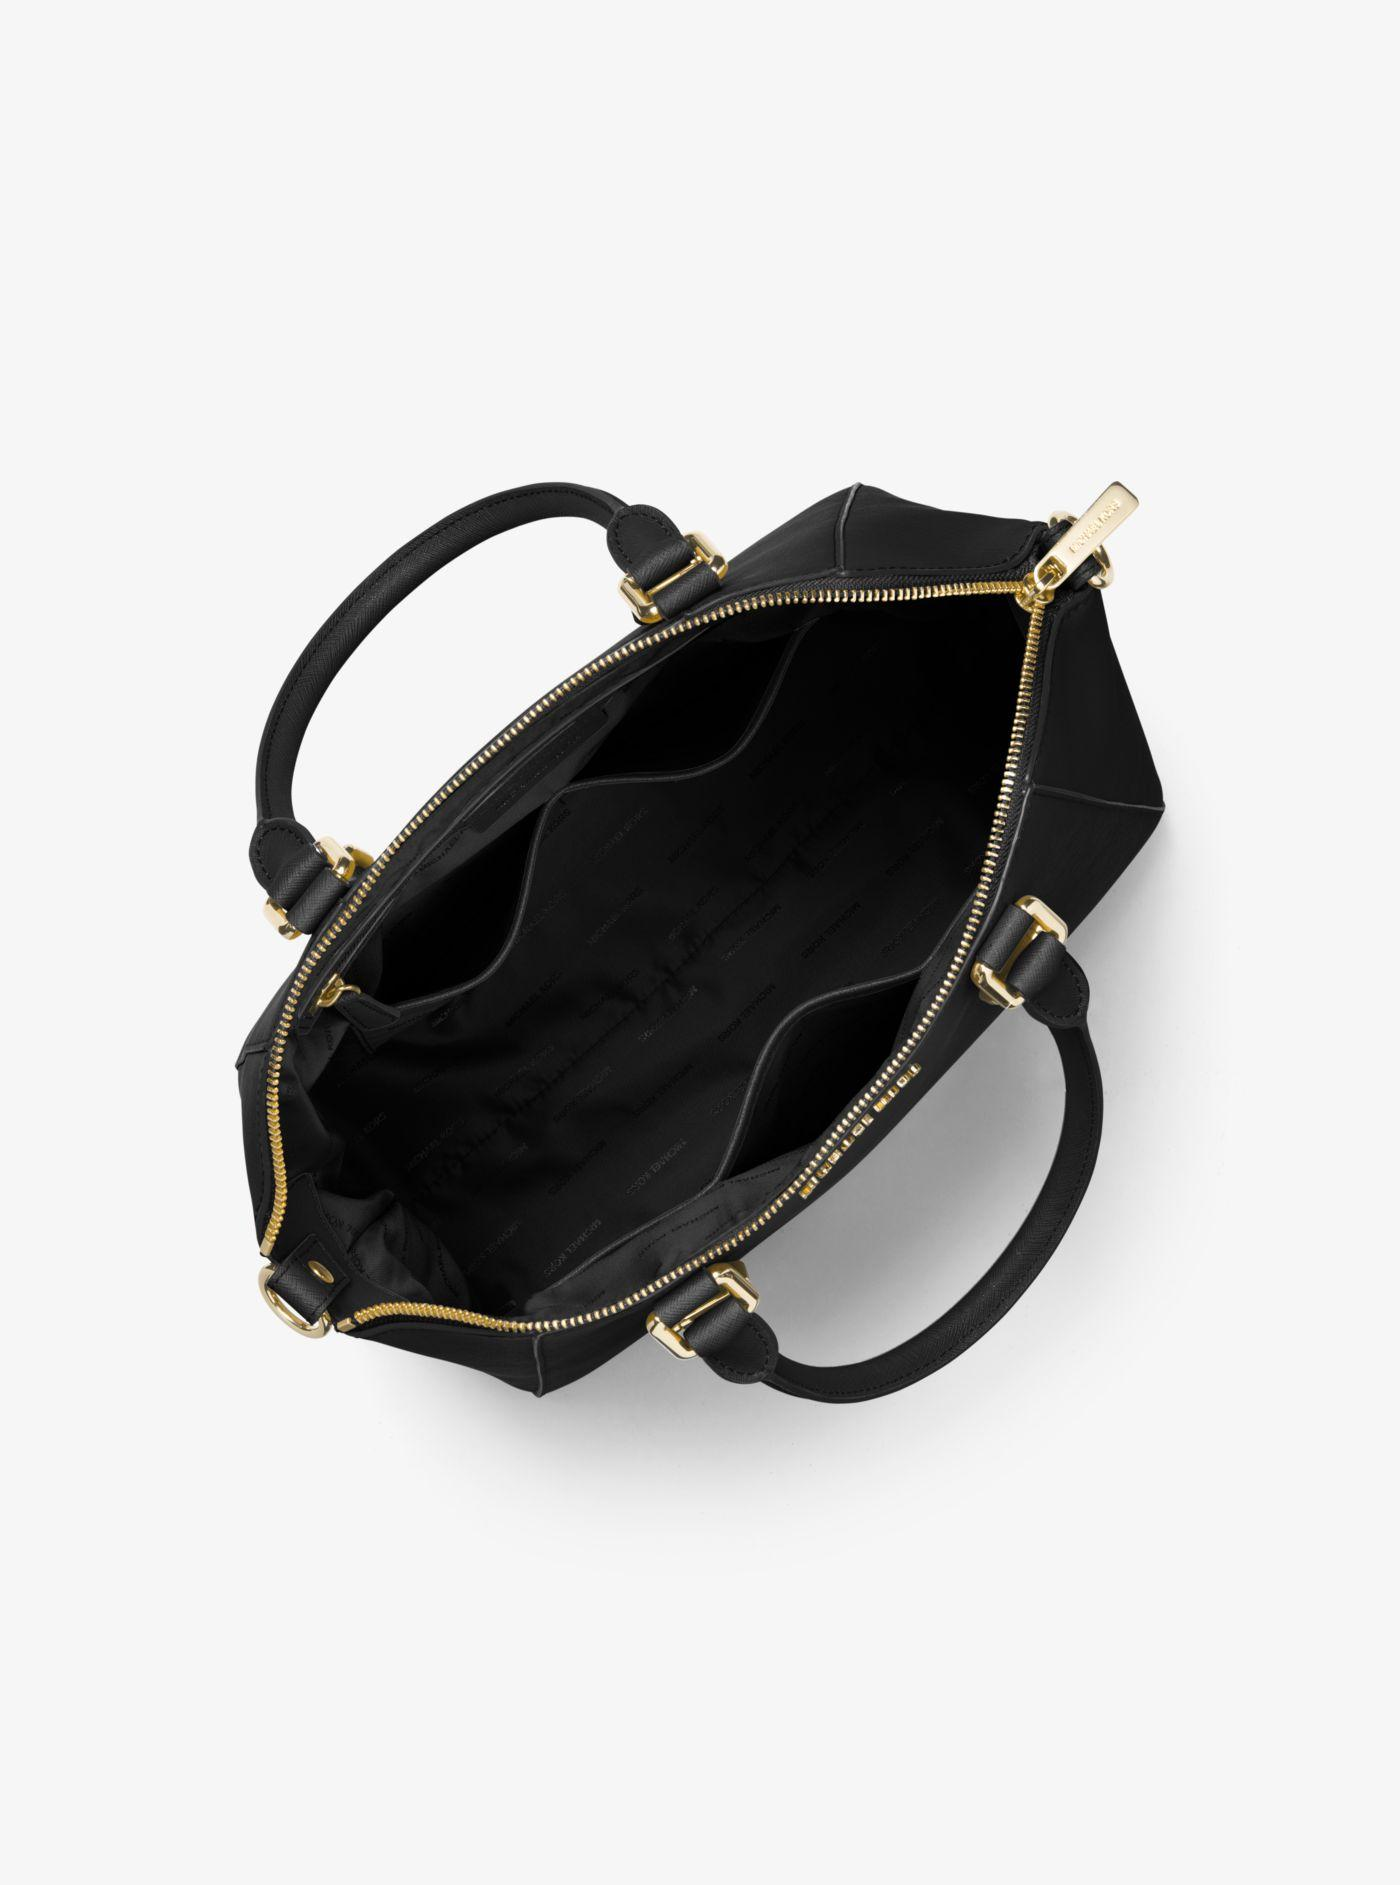 8af6450cd5cd6 Michael Kors - Black Ciara Large Saffiano Leather Satchel - Lyst. View  fullscreen